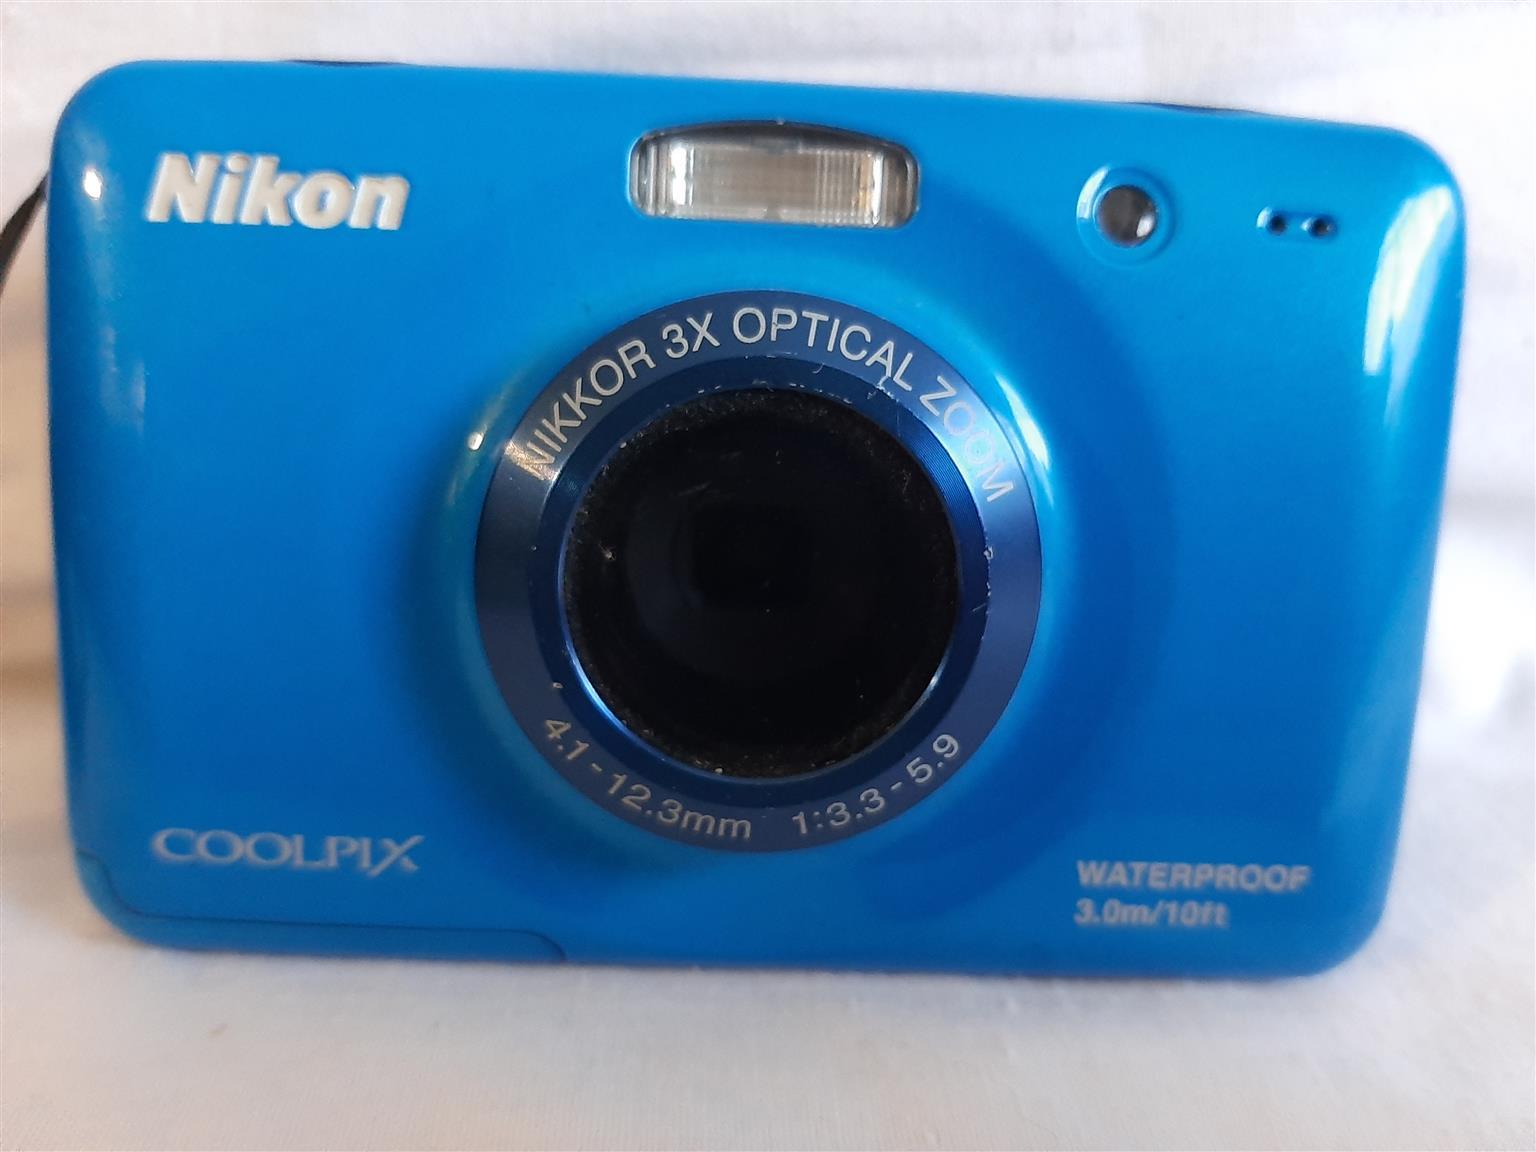 Blue Nikon Waterproof Camera